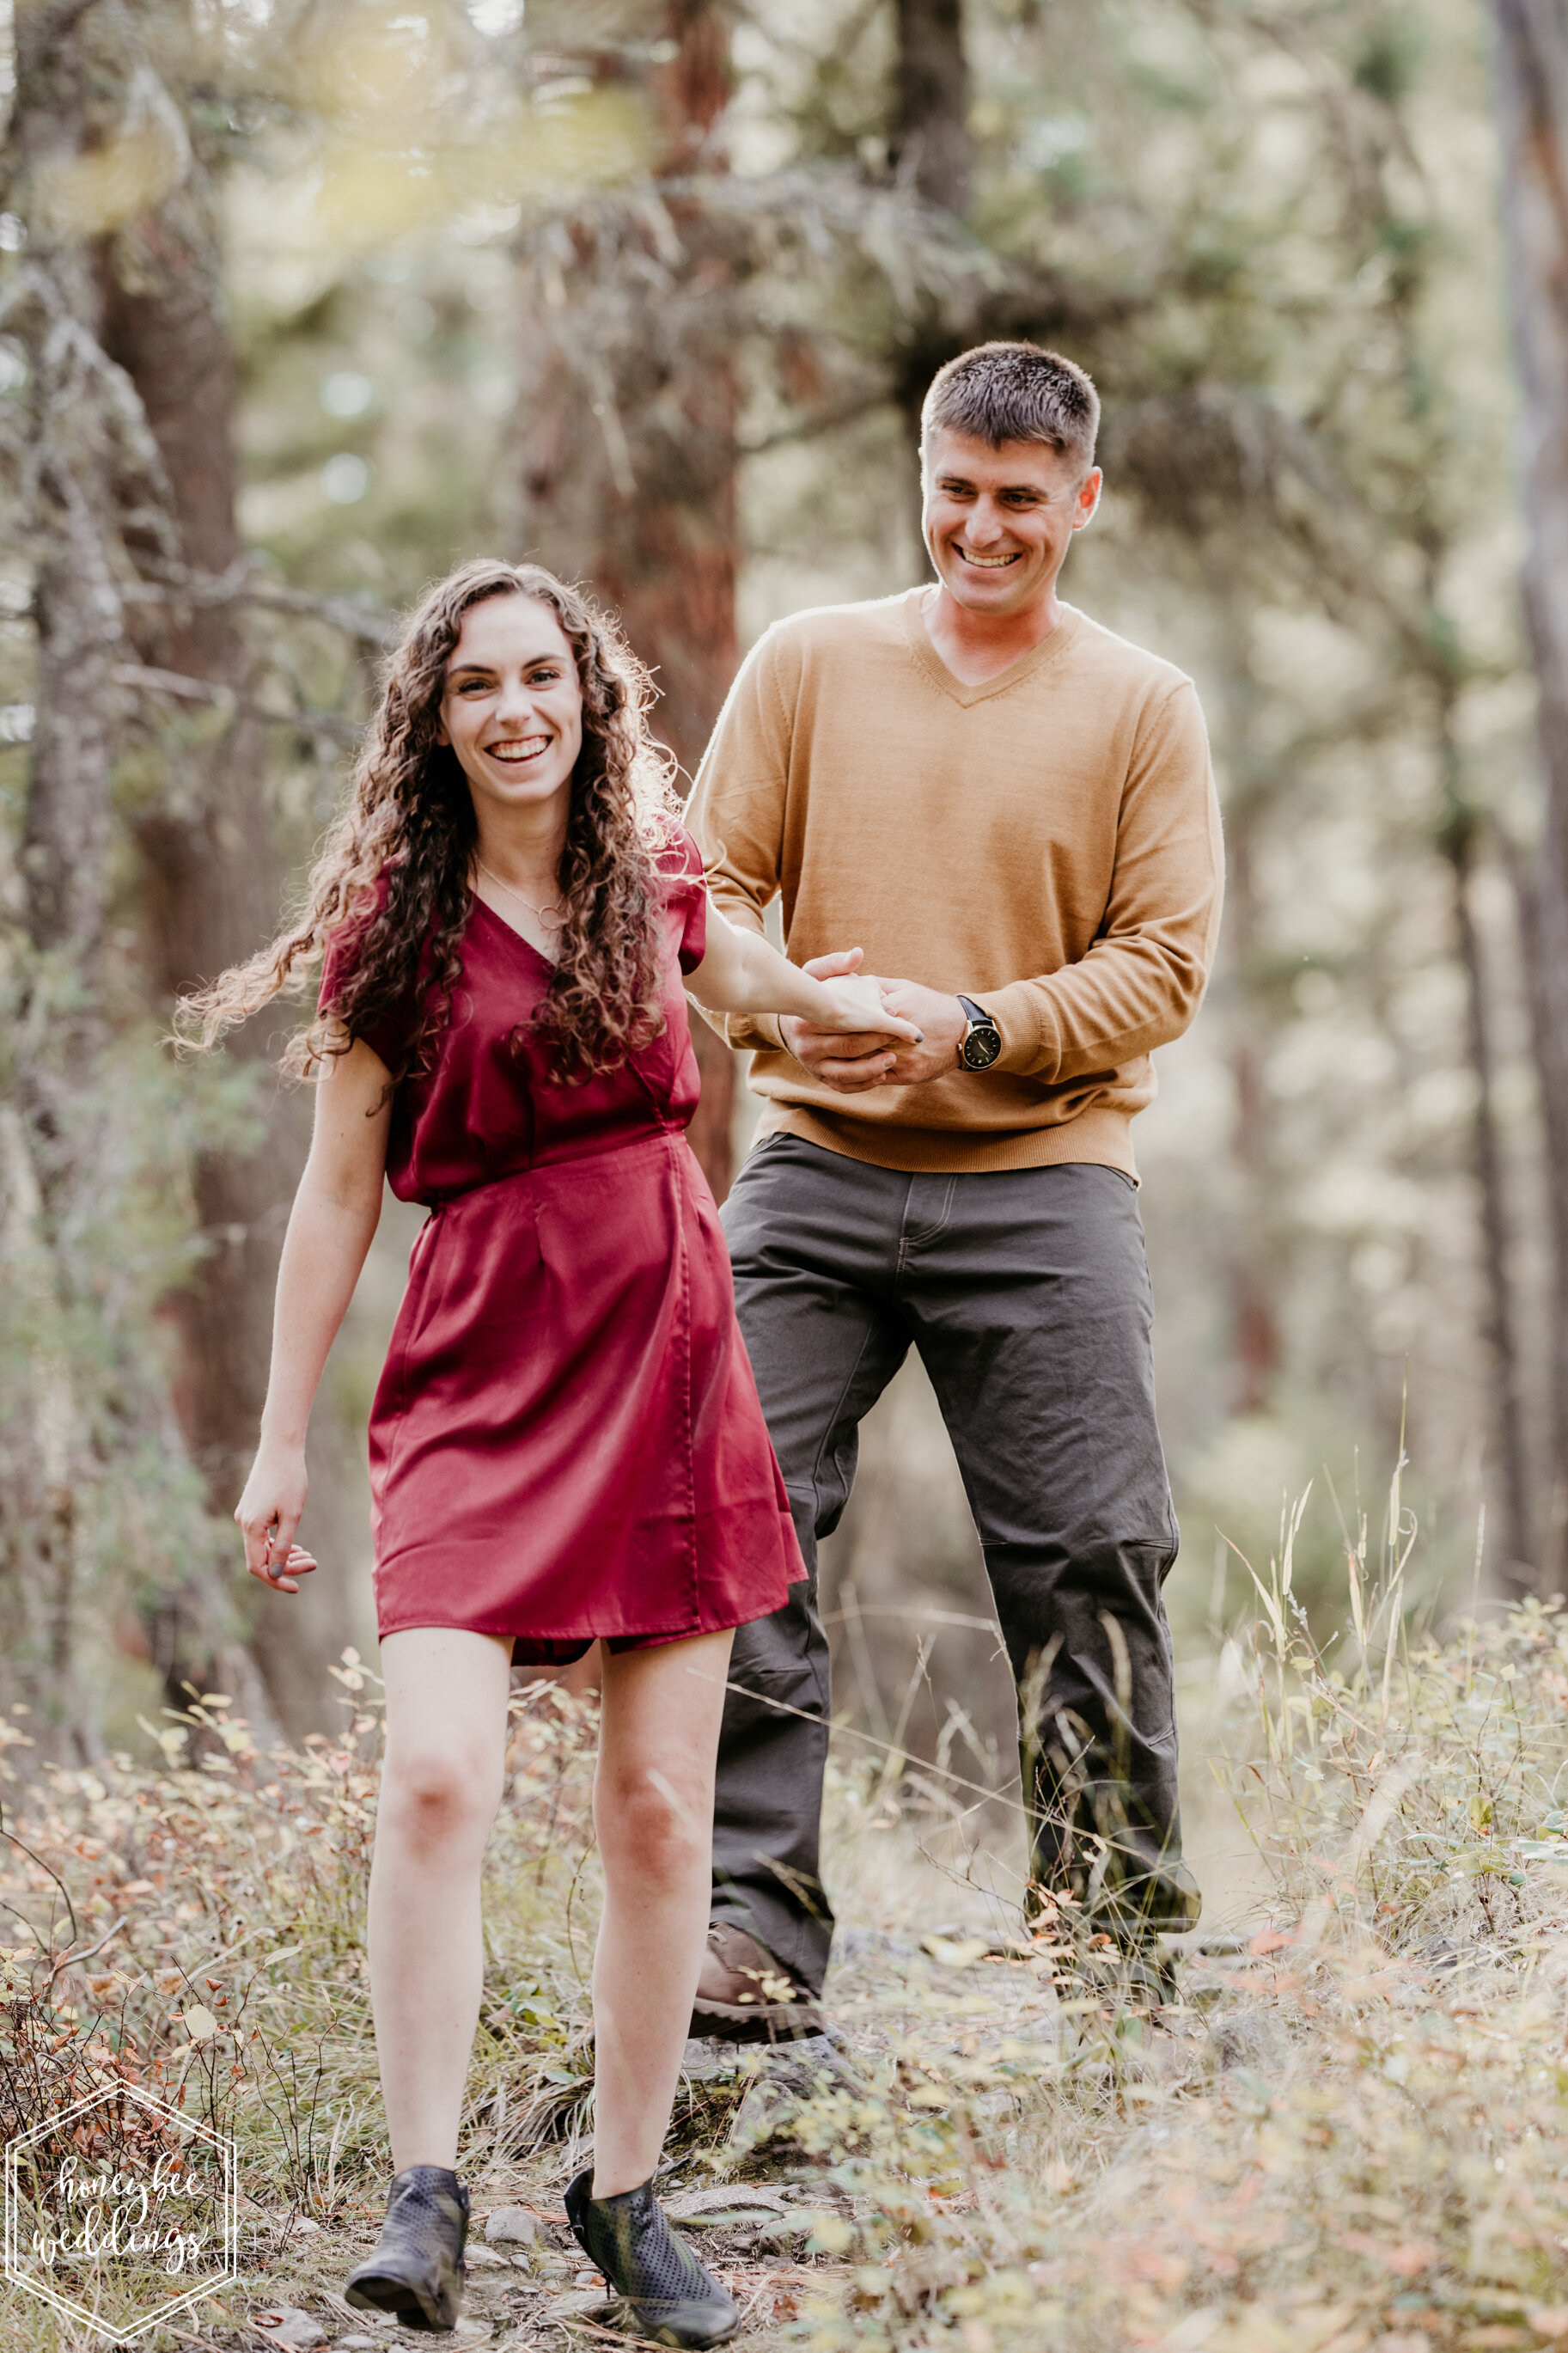 016Rock Creek Engagement_Fall Engaegment Session_Ann & Nick_September 22, 2019-74.jpg